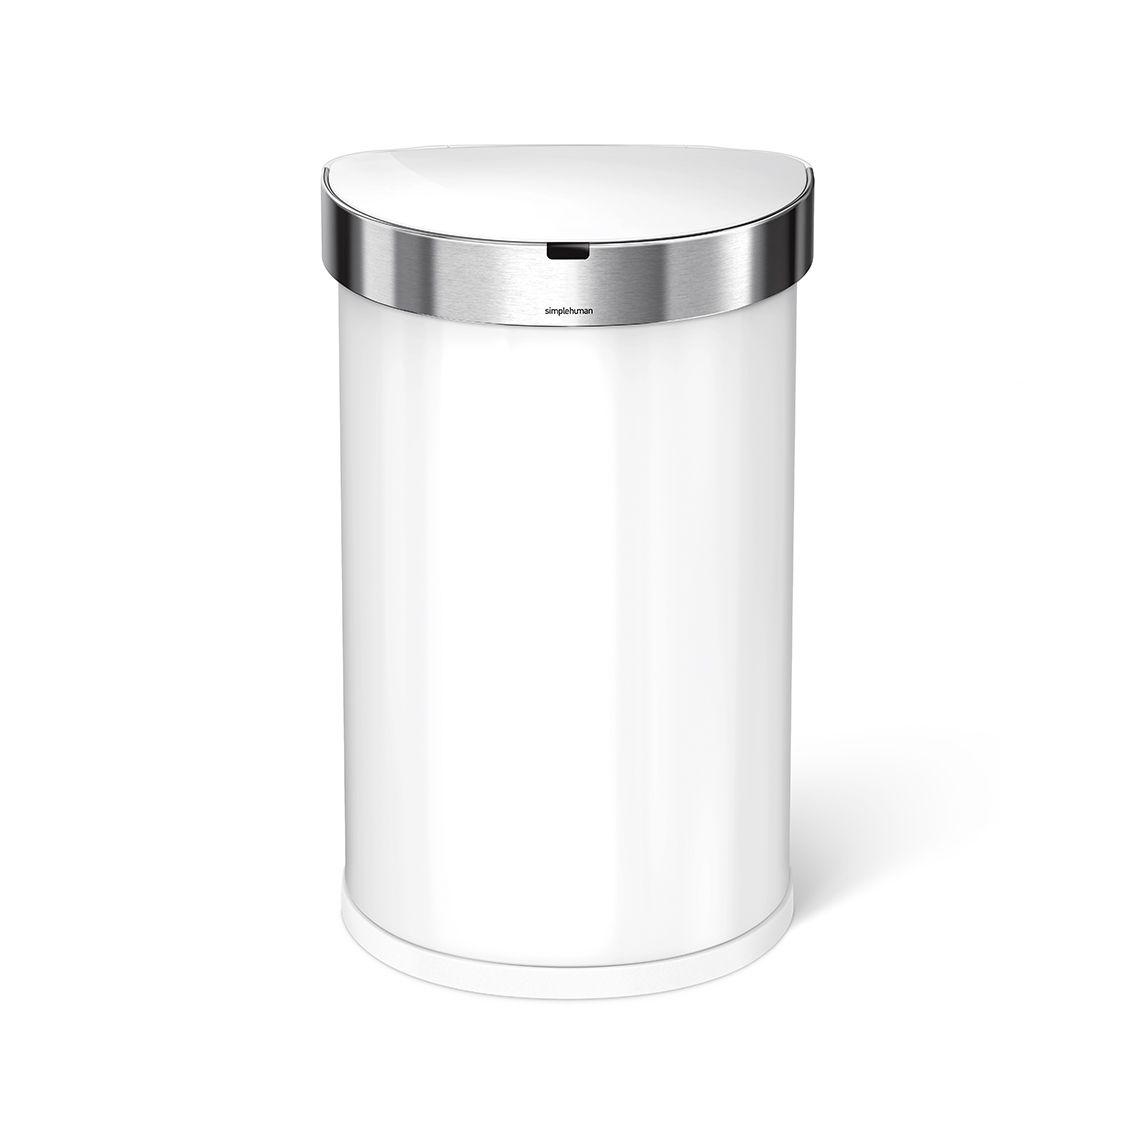 Bezdotykový odpadkový koš Simplehuman - 45 l, půlkulatý, bílá ocel, dávkovač sáčků